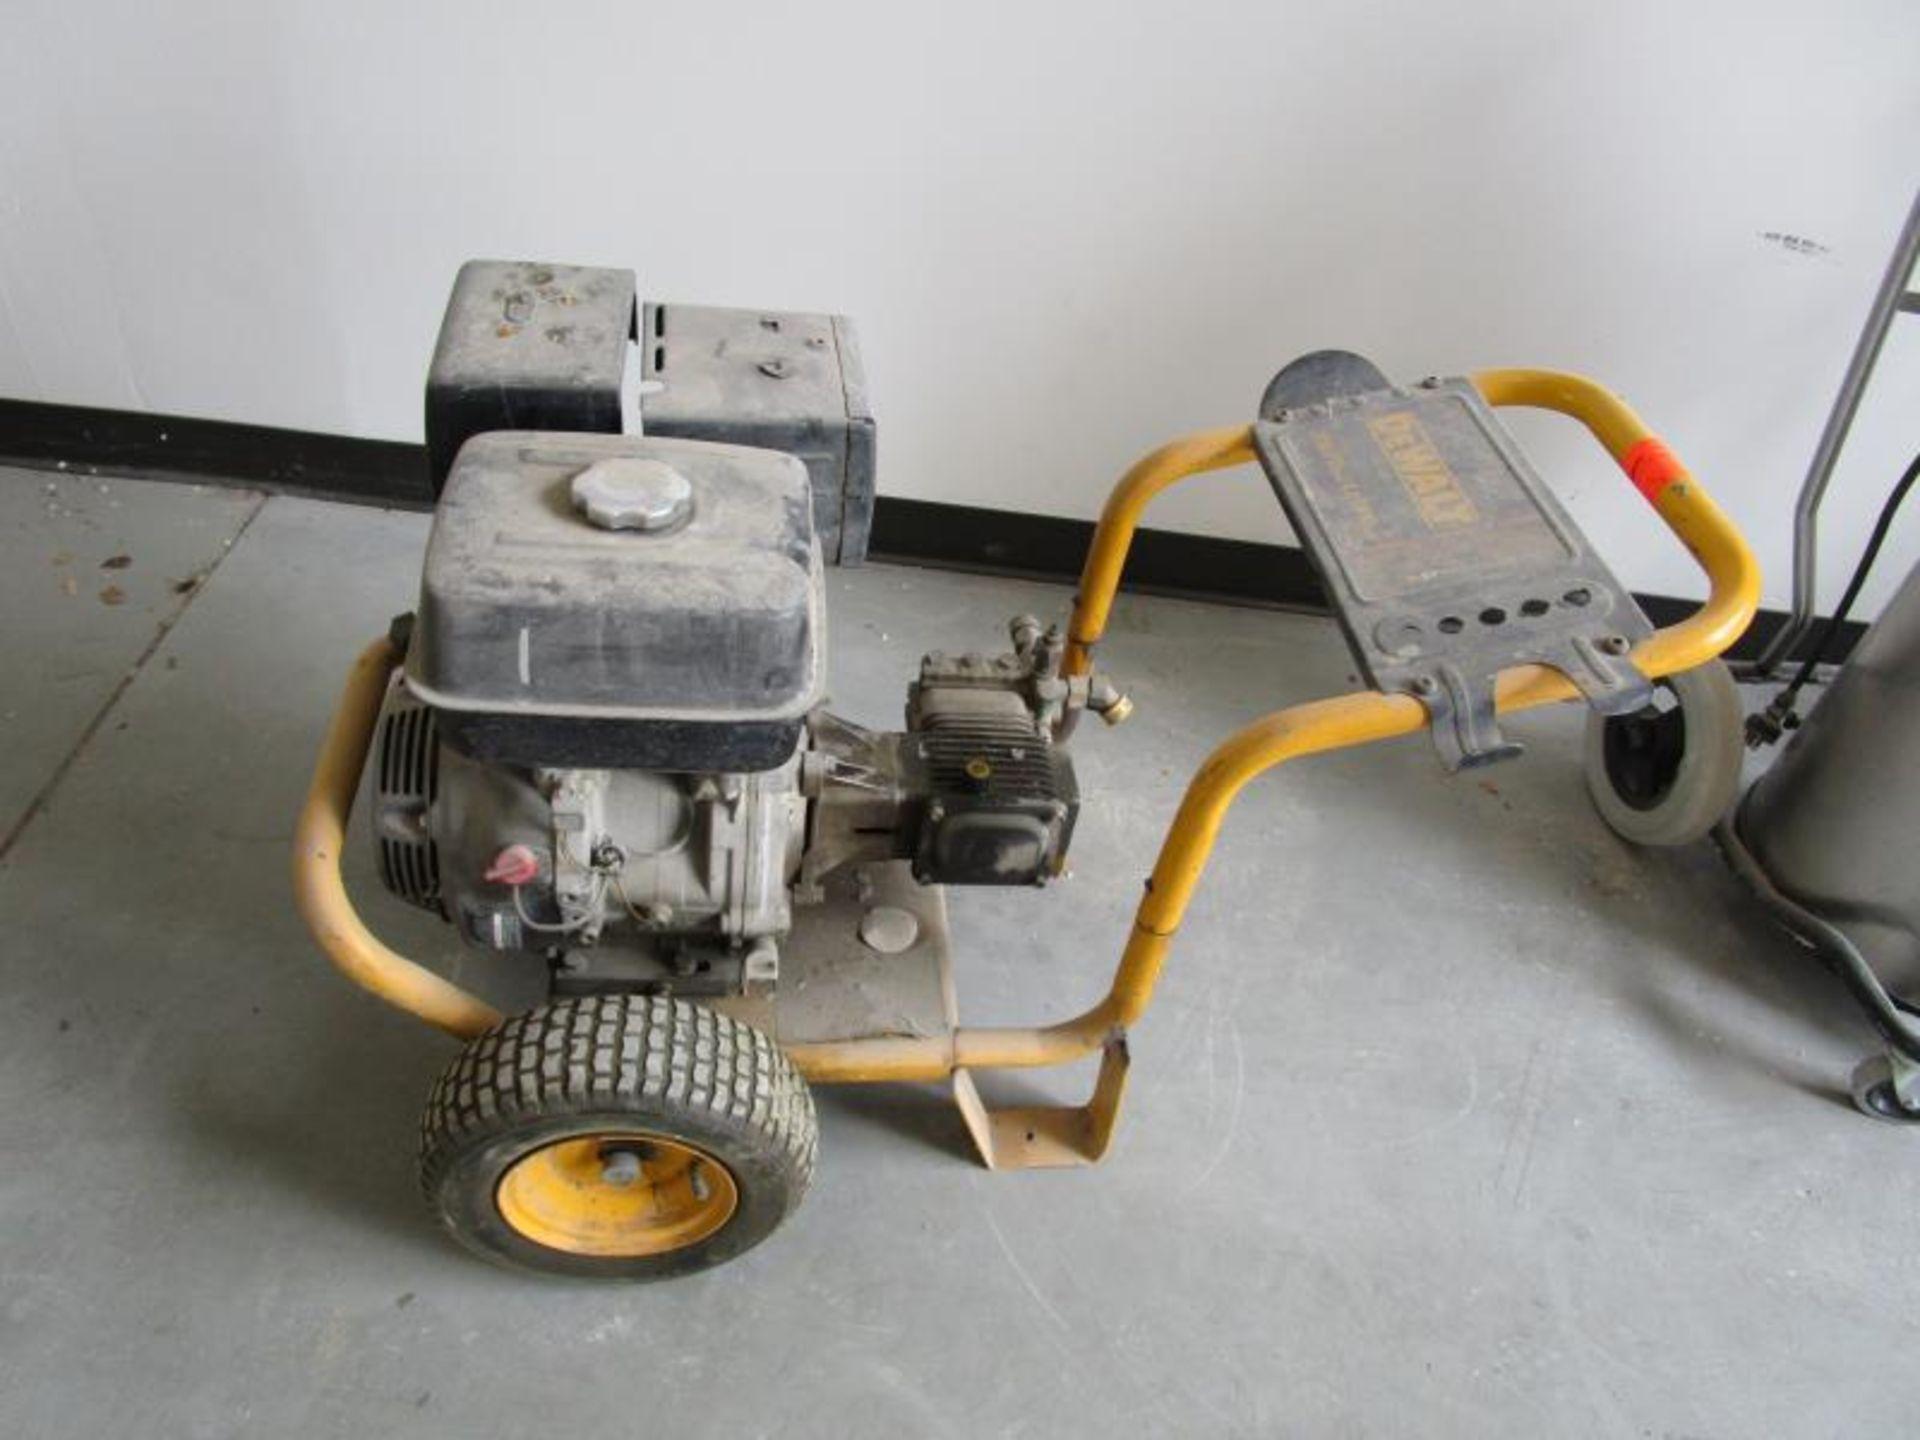 Lot 23 - Dewalt Pressure Washer, 3750 PSI Max, 4.0GPM, Model: DP3750